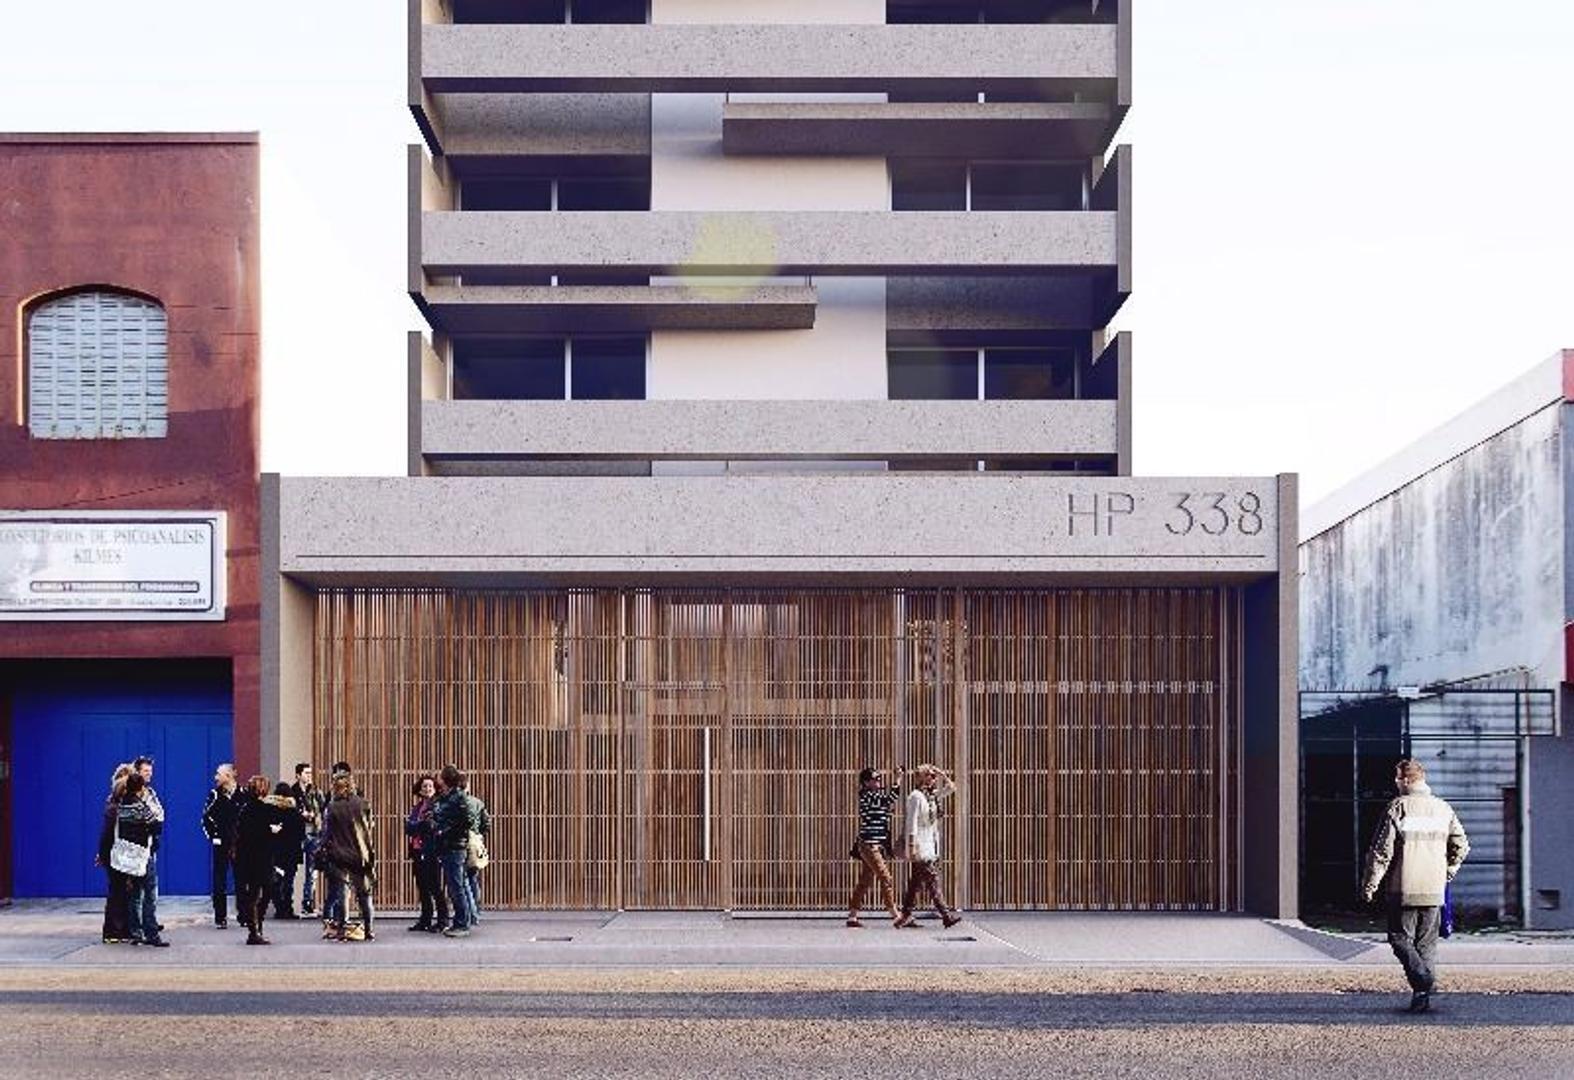 PREVENTA-EXCELENTE EDIFICIO EN POZO HUMBERTO PRIMO 338 QUILMES CENTRO